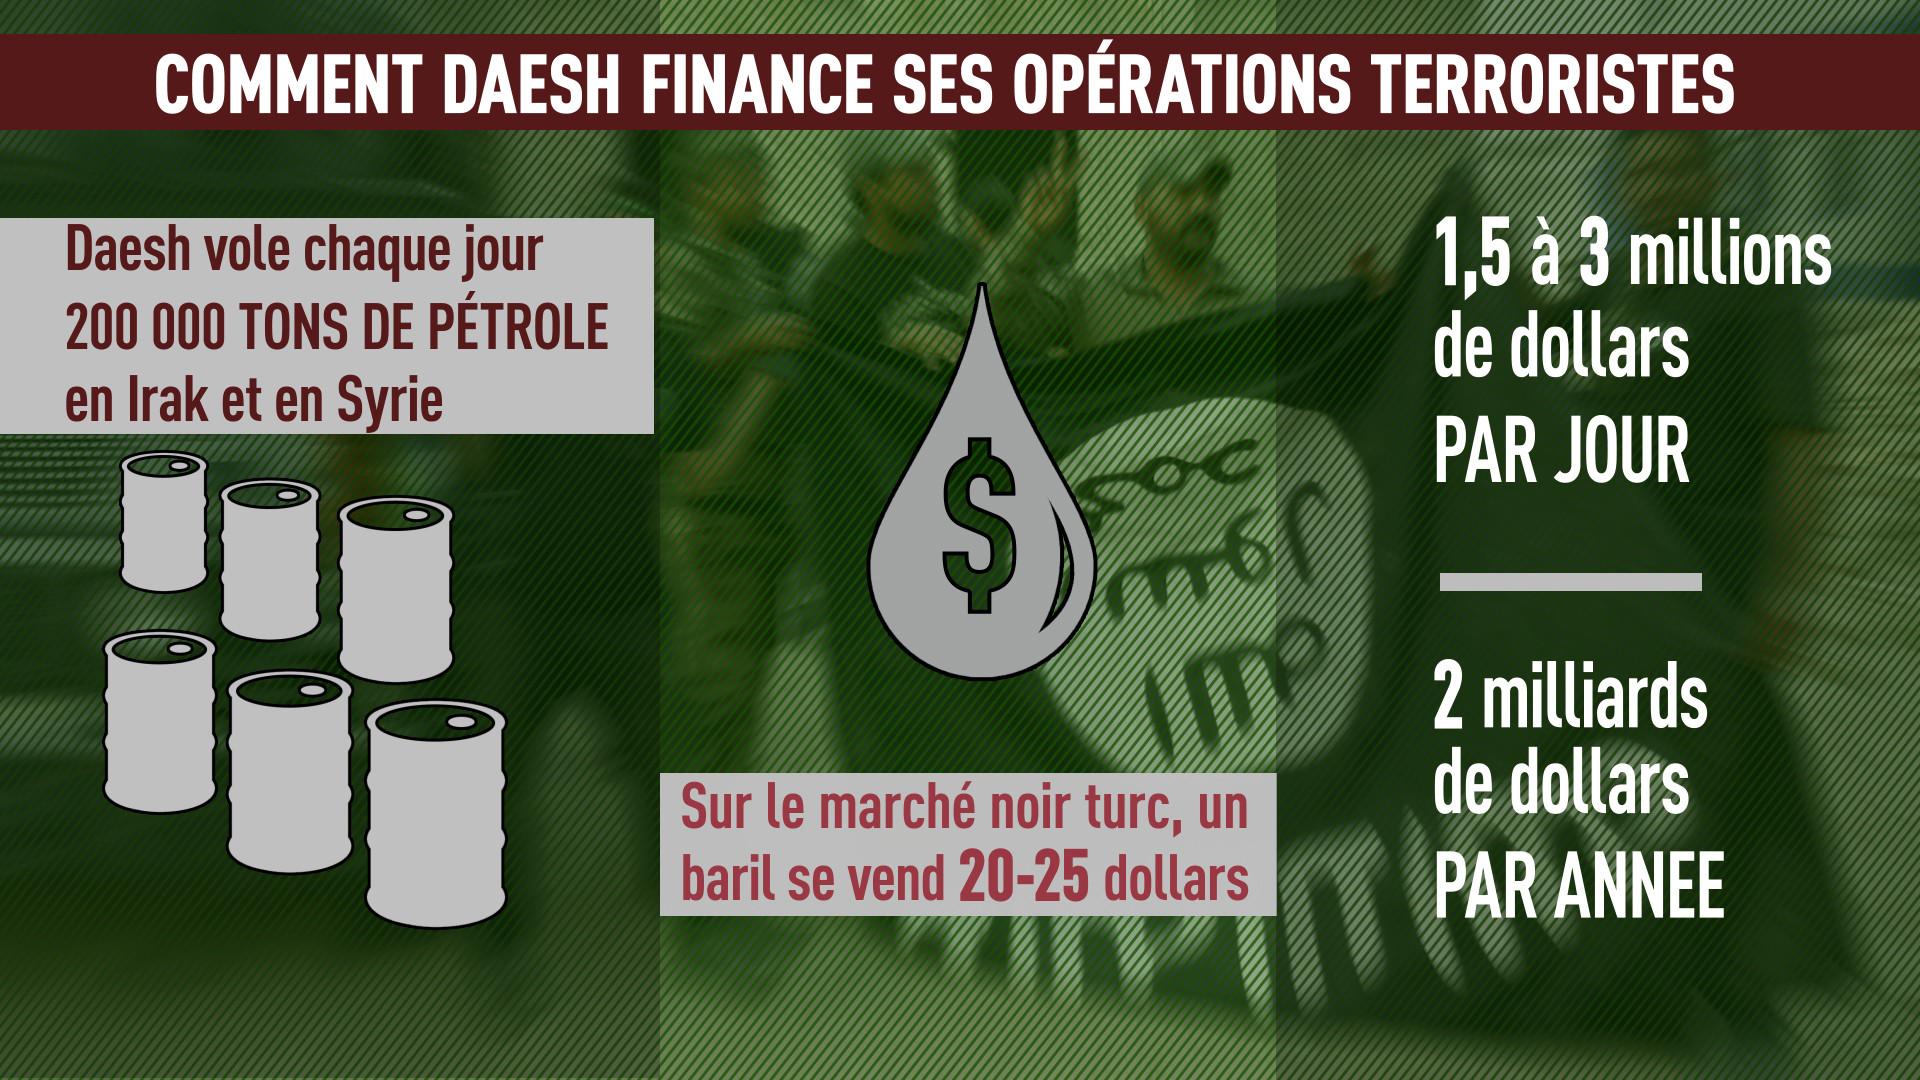 Al-Abadi : «La contrebande de pétrole de Daesh en Turquie menace la souveraineté de l'Irak»